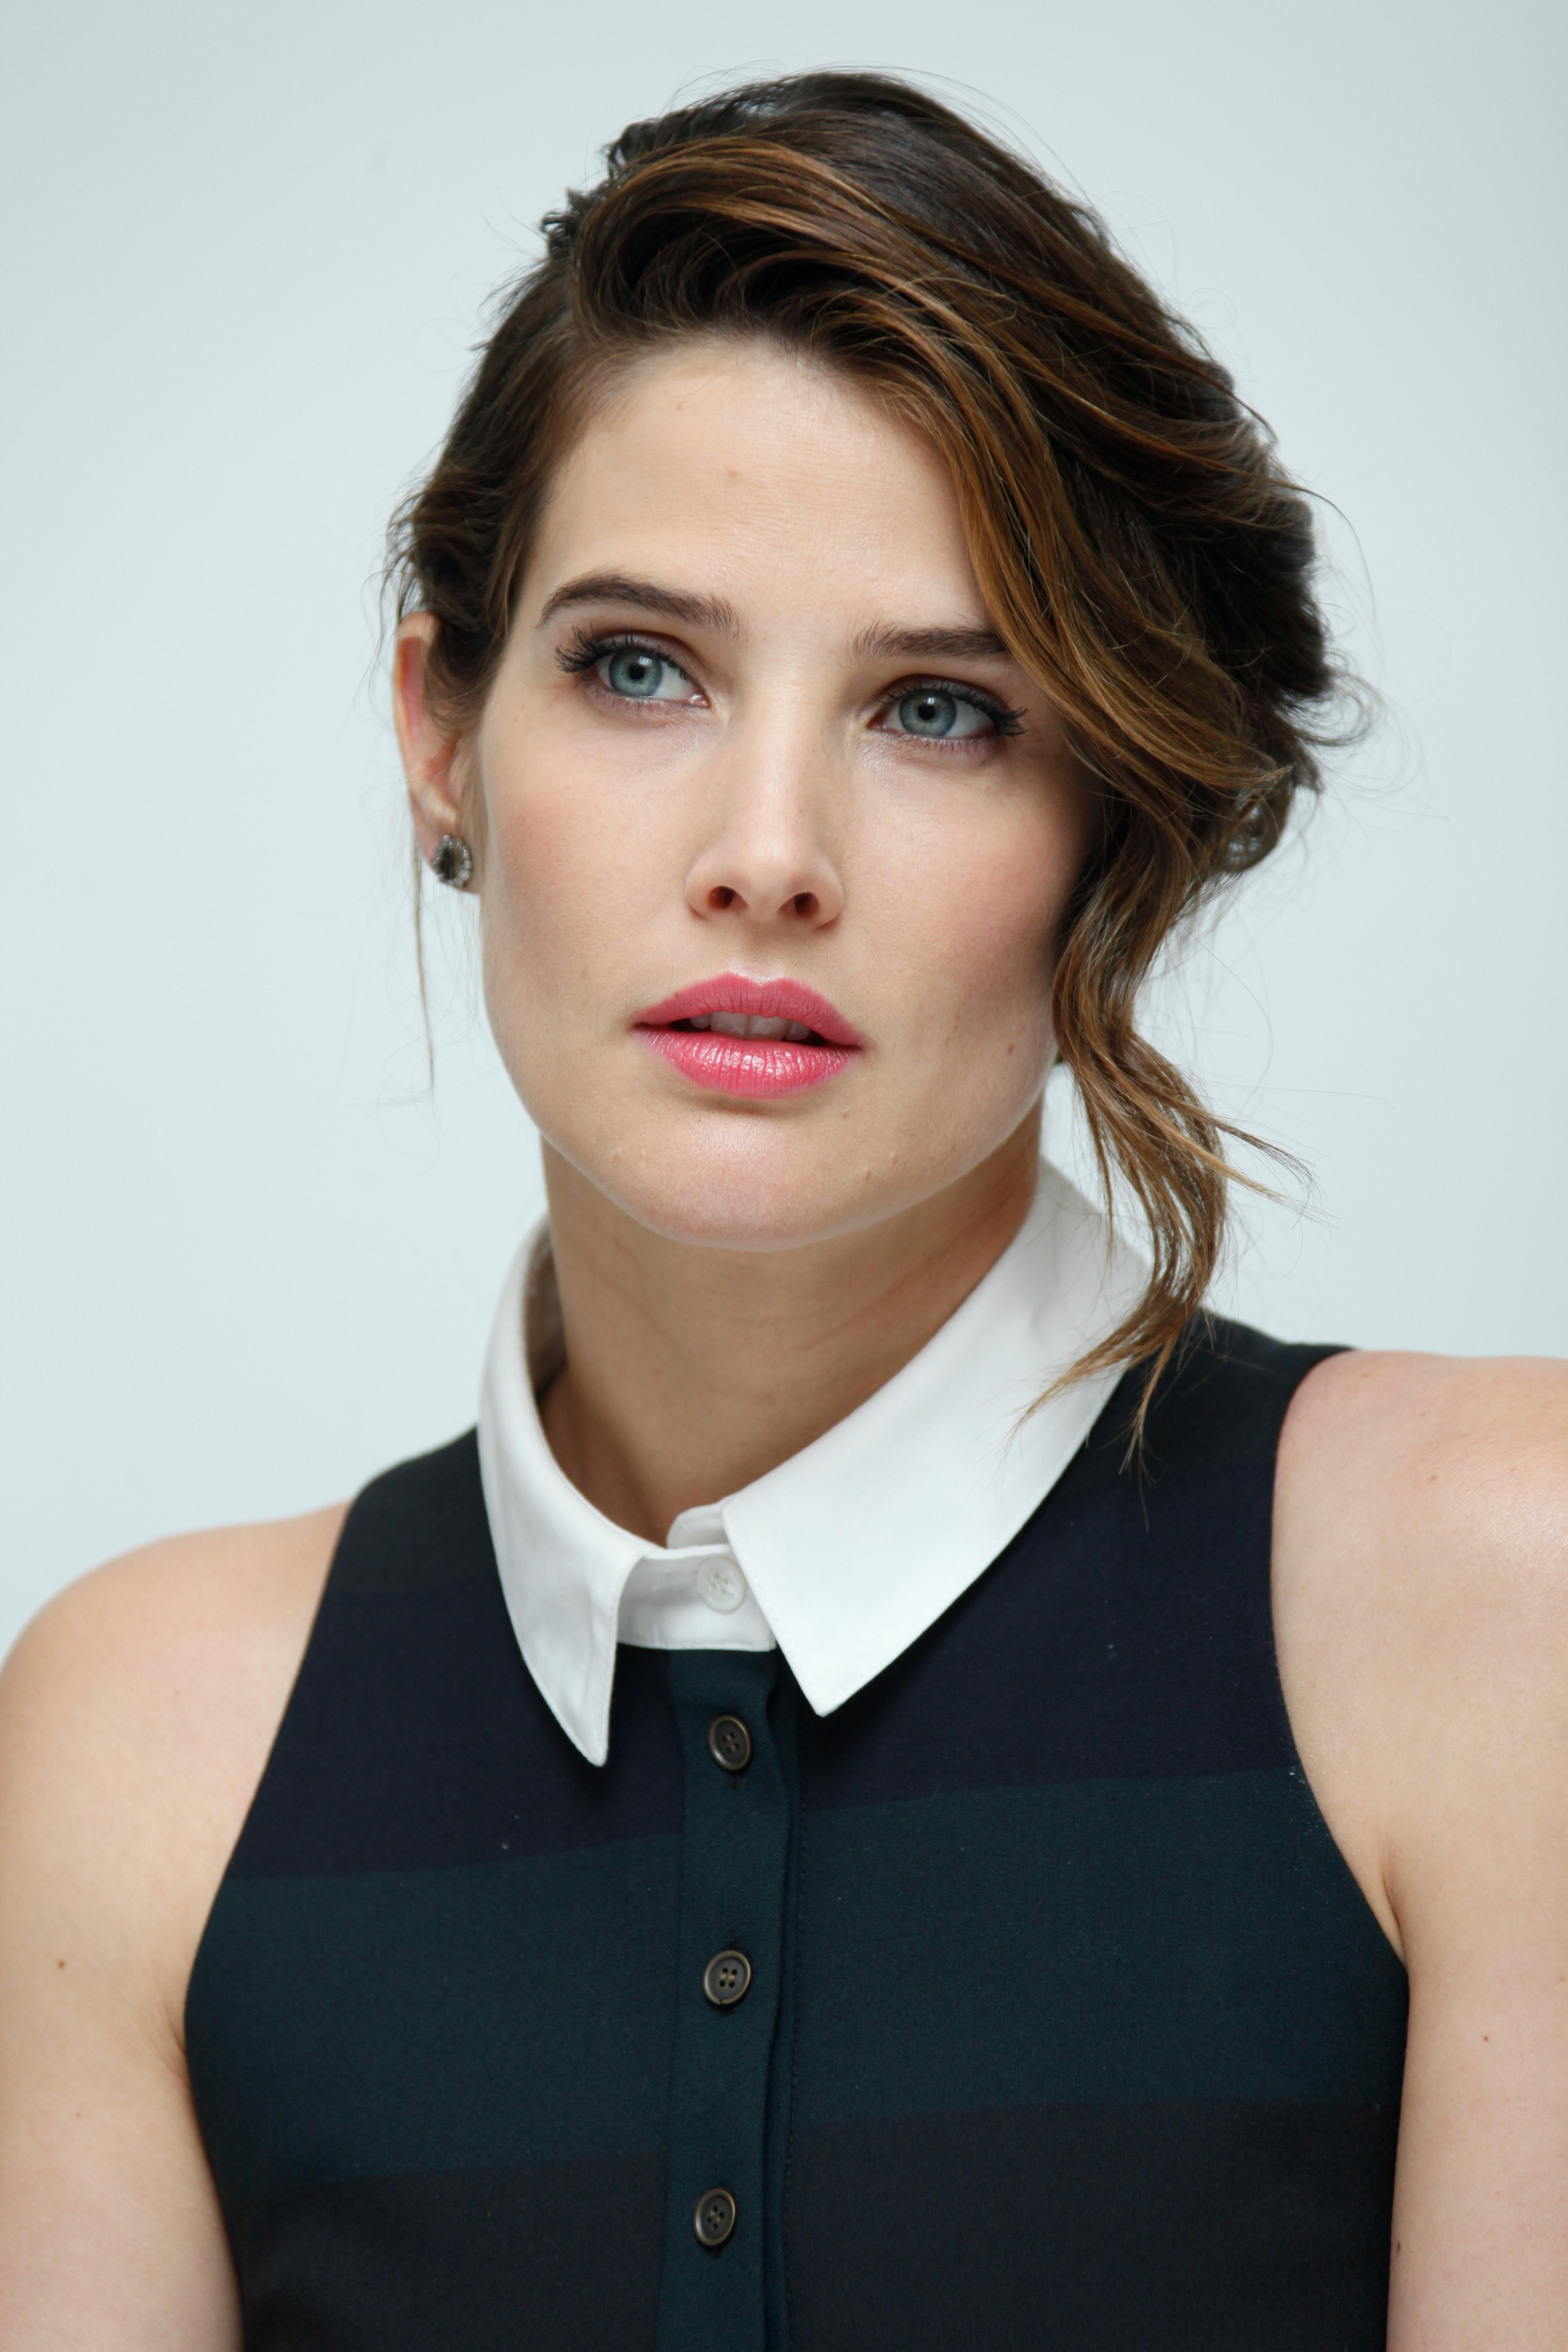 Cobie Smulders HD wallpapers, Desktop wallpaper - most viewed